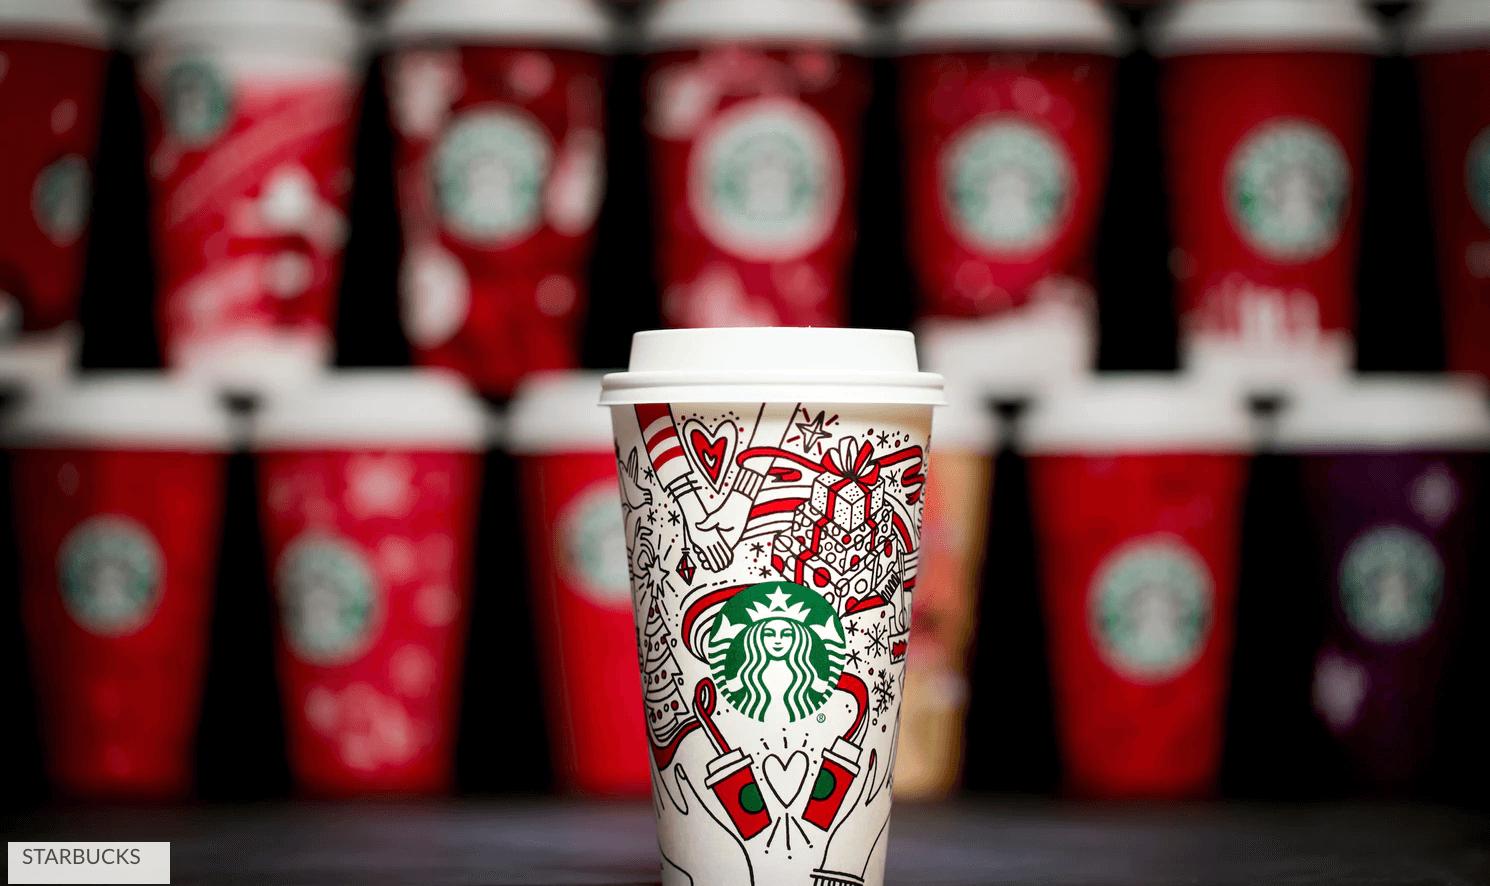 Starbucks: Creating Tradition to Spark Joy